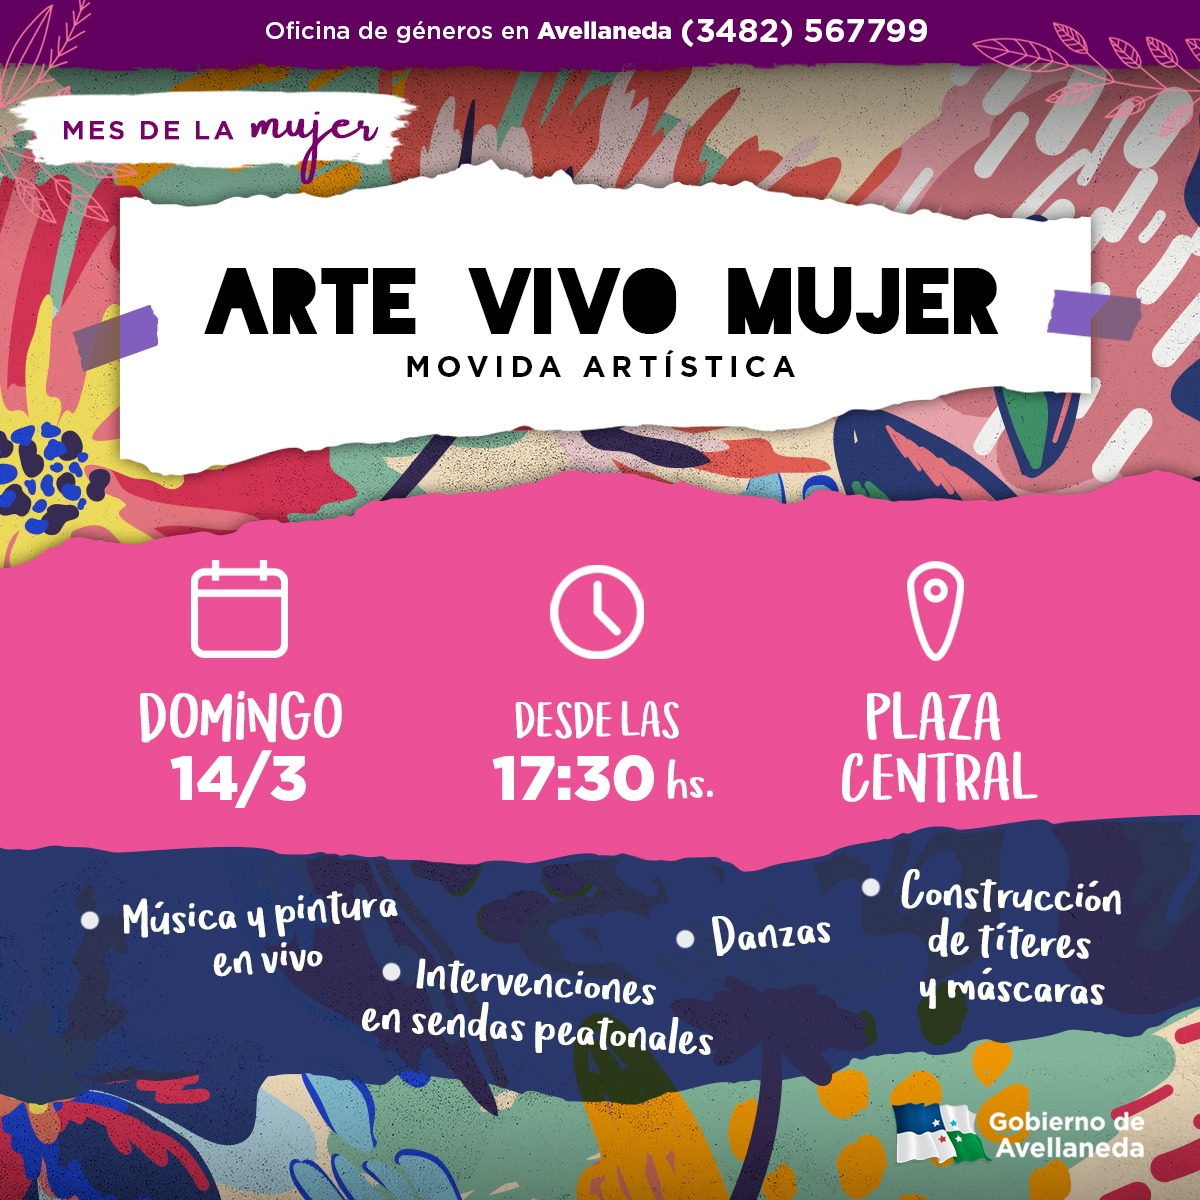 Mes de la Mujer: sumate a la movida cultural en la Plaza Central de Avellaneda